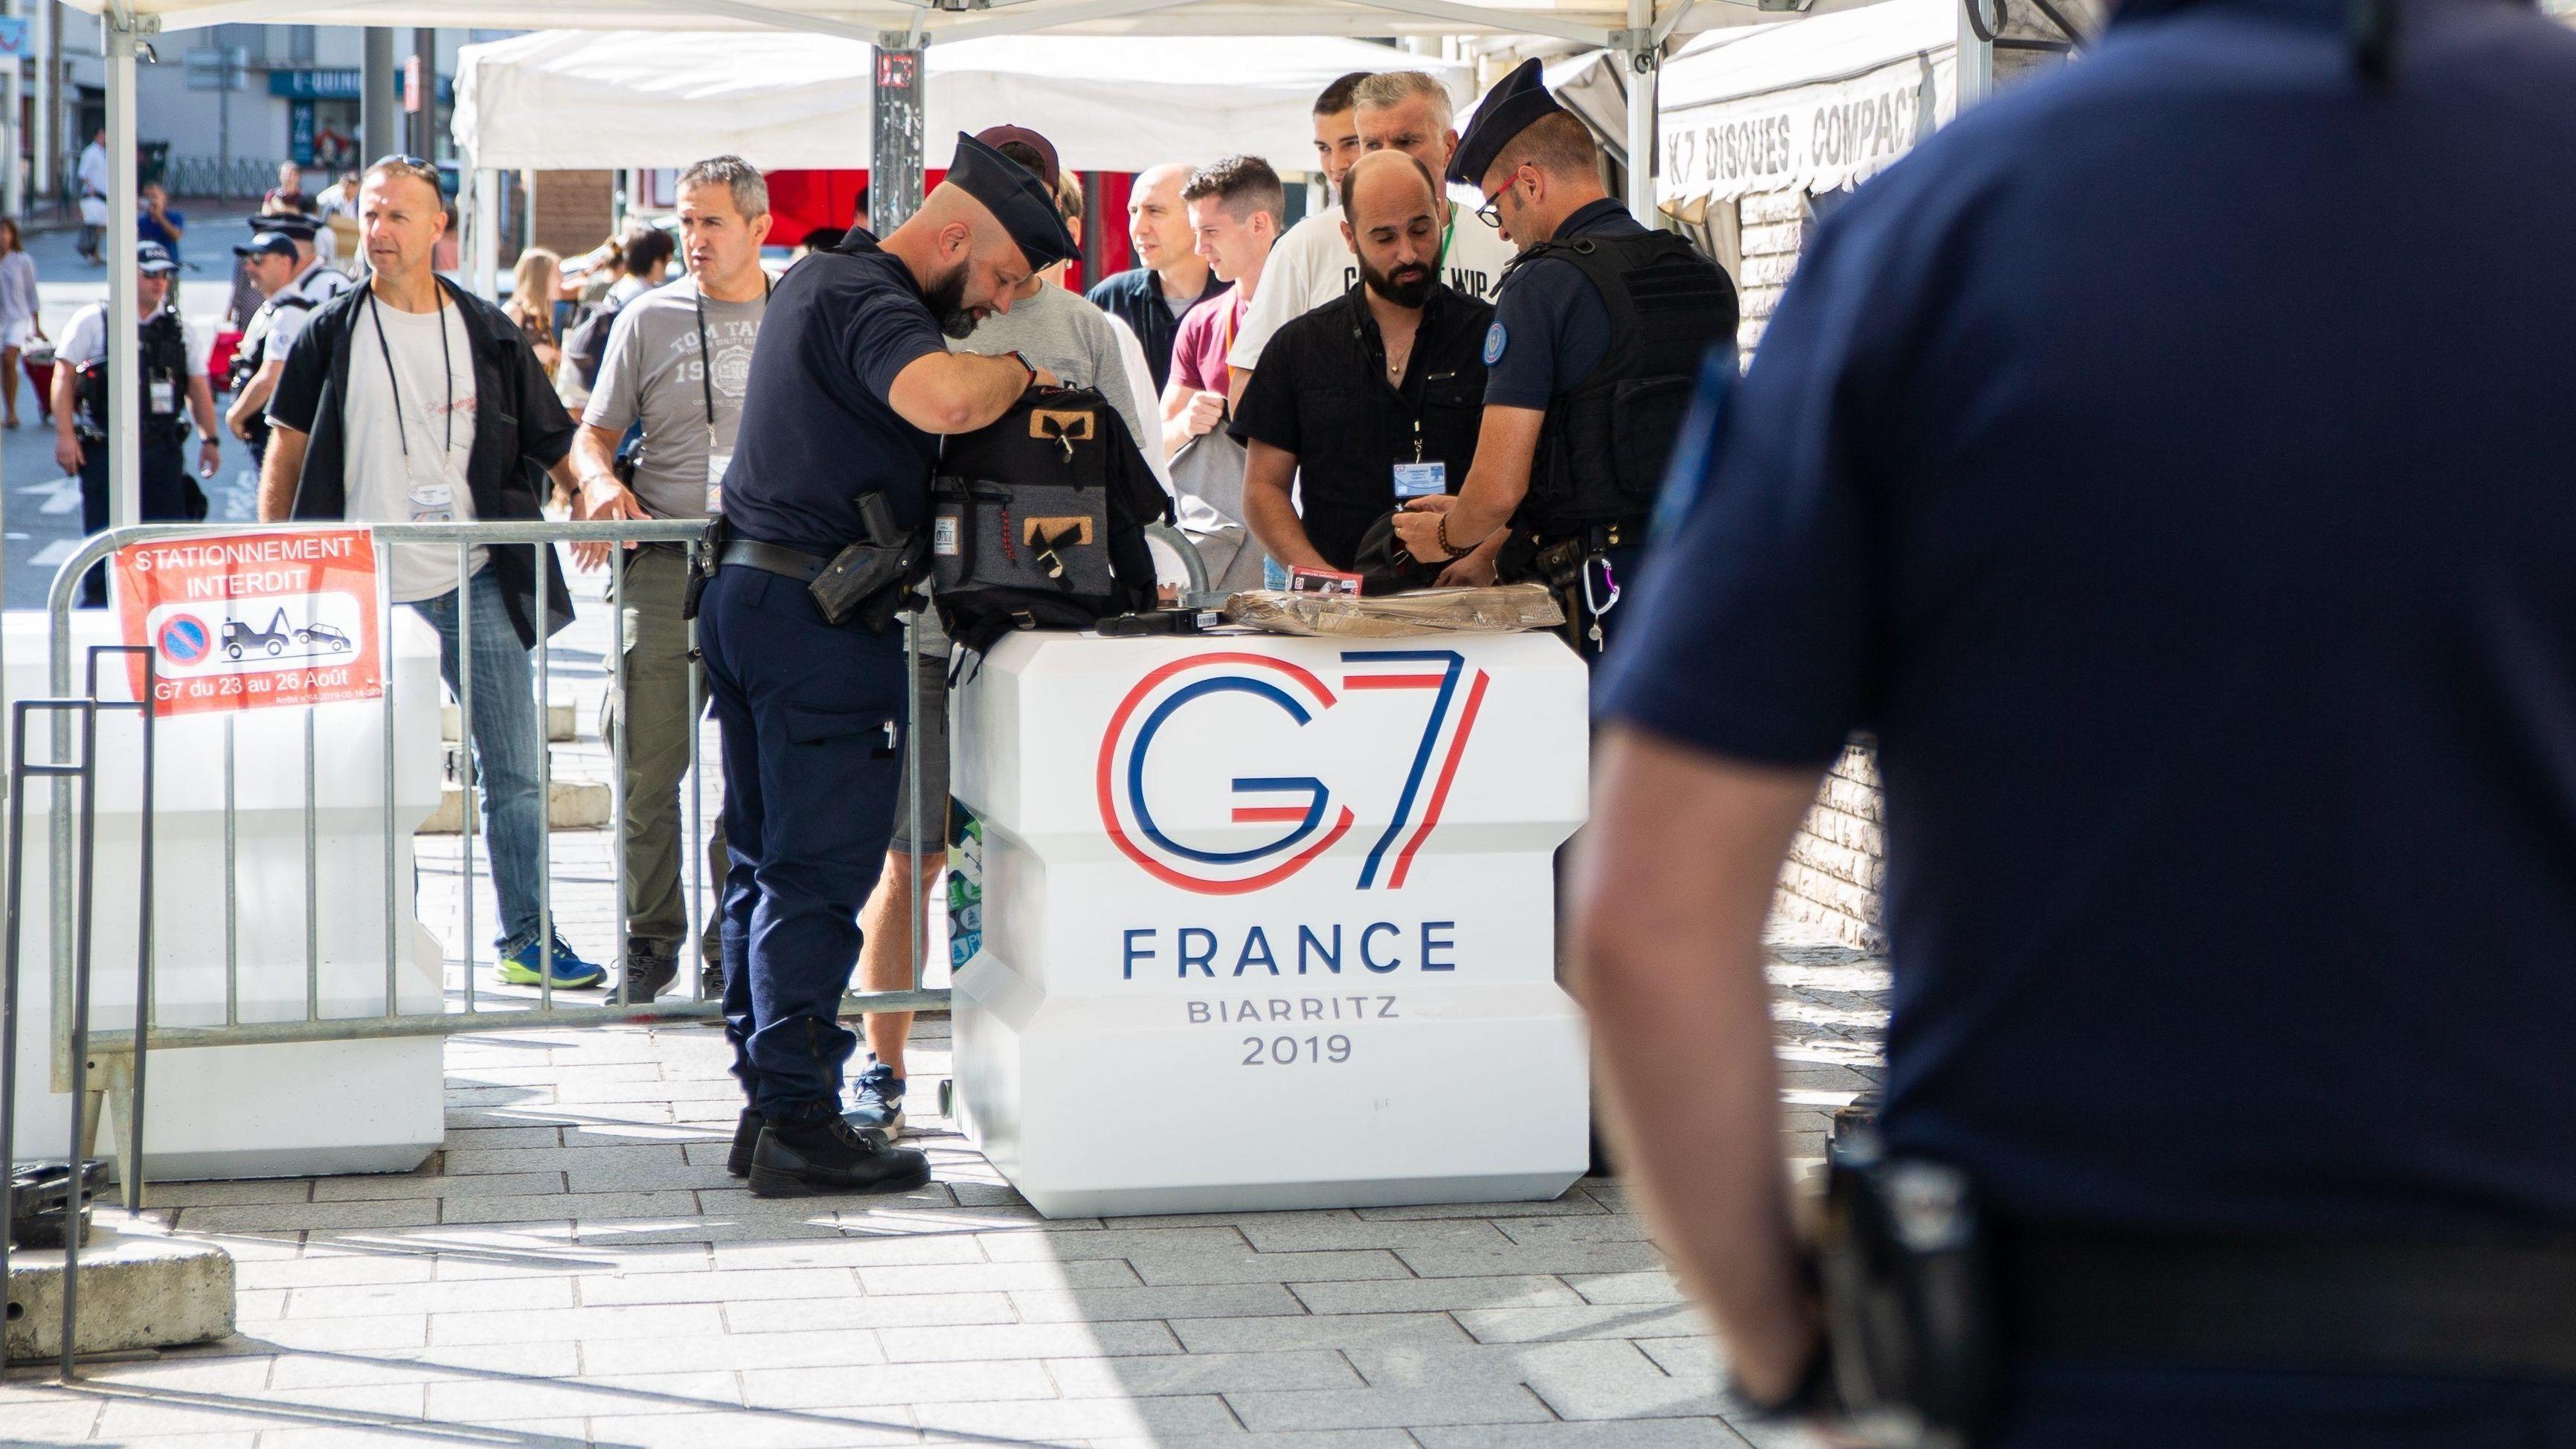 Sicherheitskontrolle in Biarritz